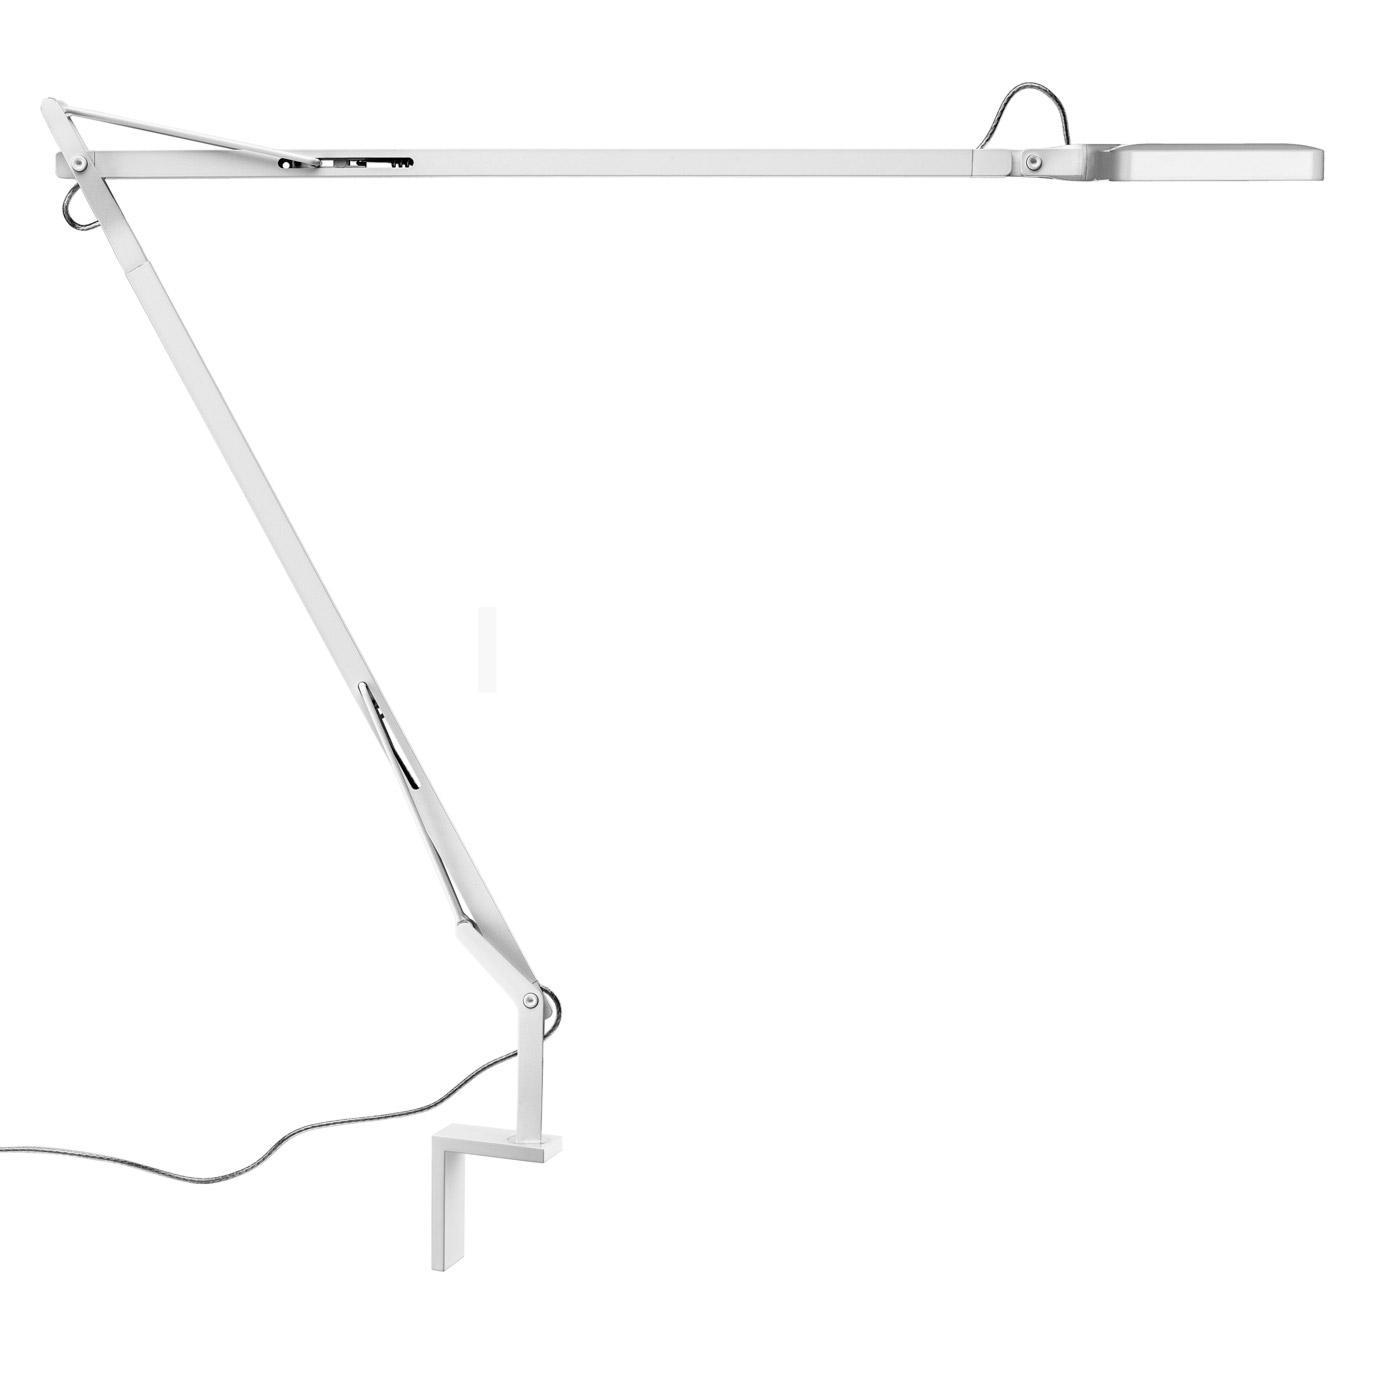 Kelvin LED Lamp Balanced-arm lamp with wall bracket anthracite